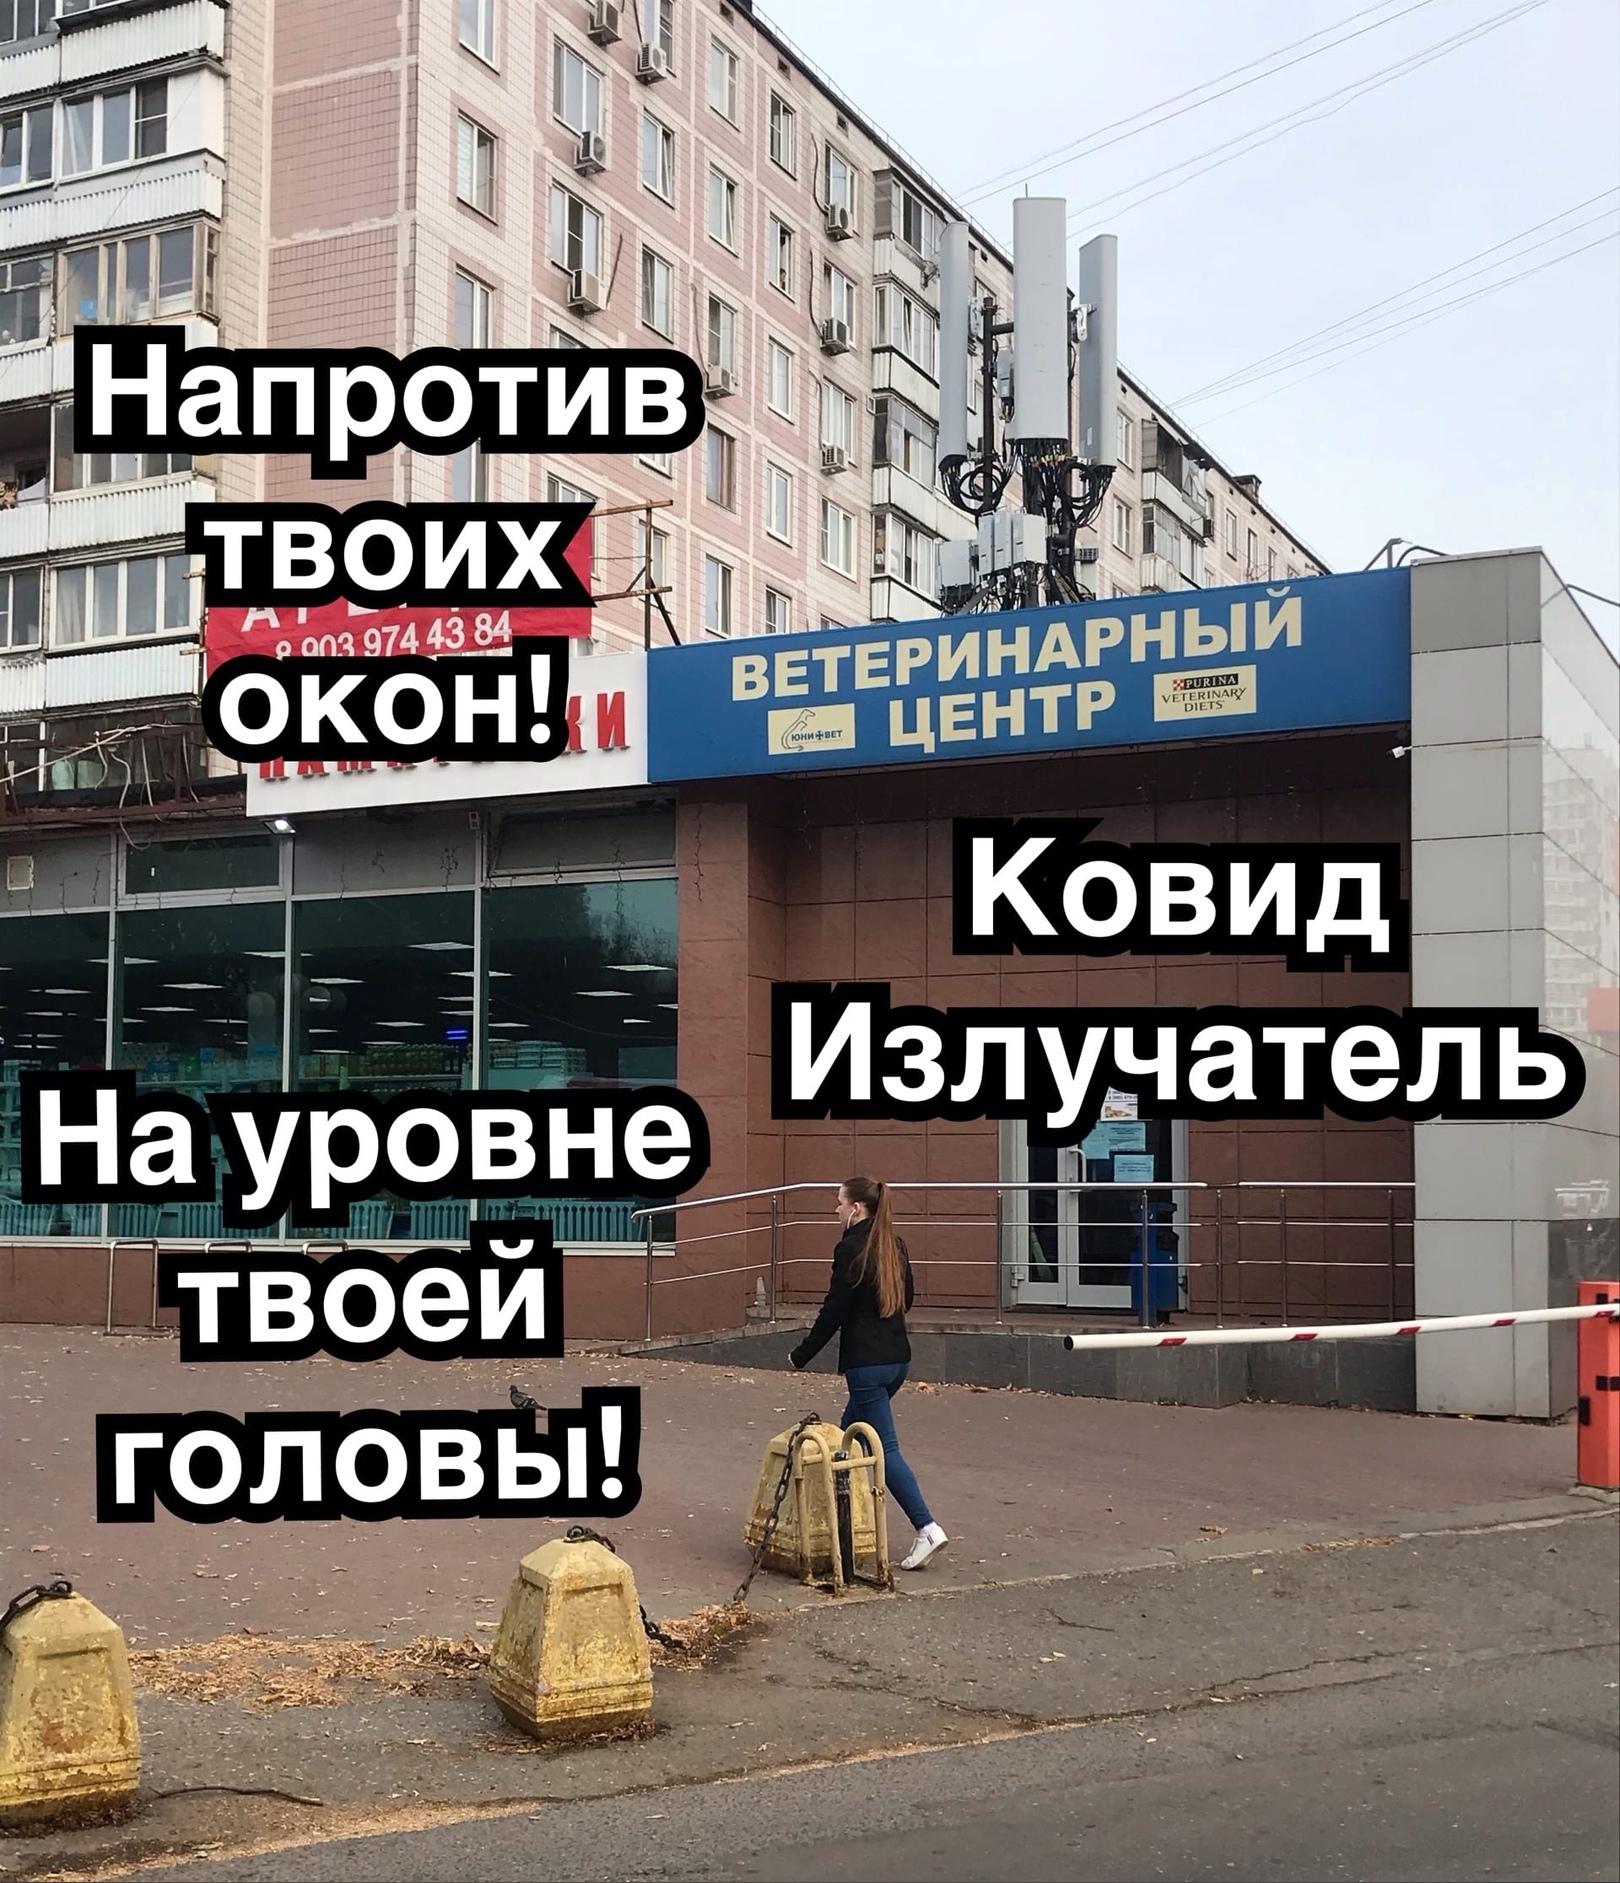 UjMkljYQ_rk